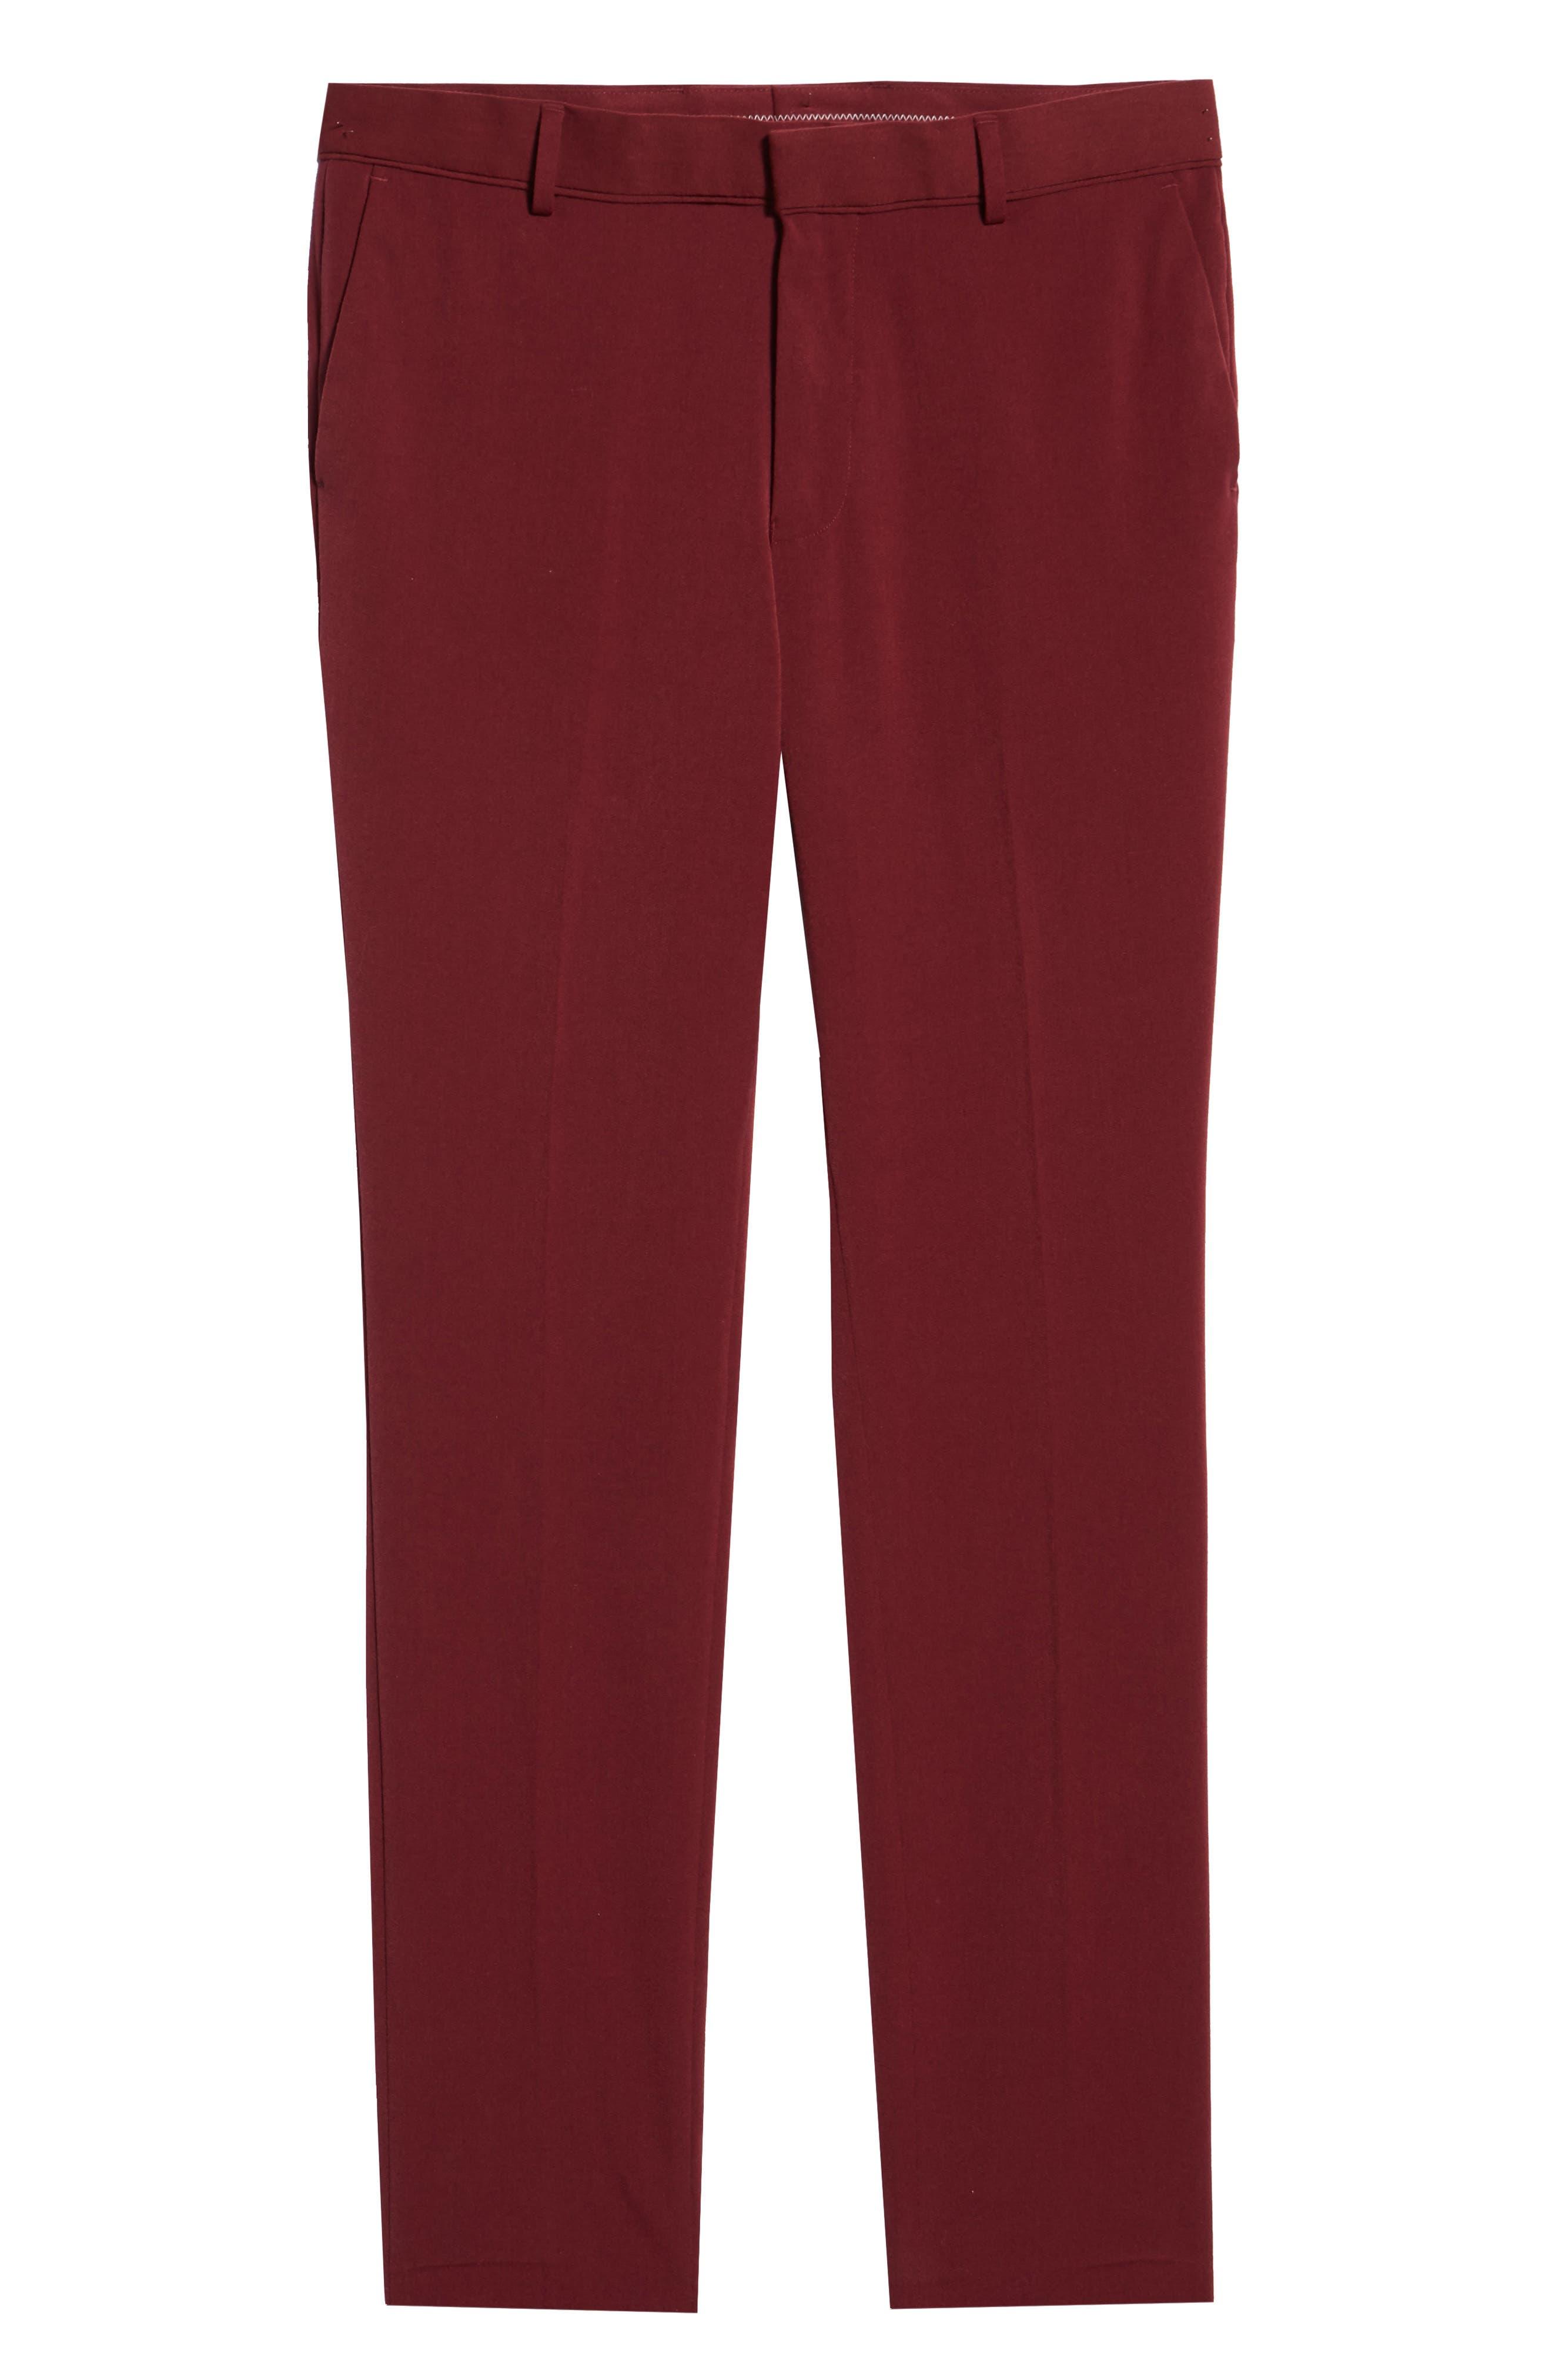 Skinny Fit Trousers,                             Alternate thumbnail 6, color,                             PURPLE